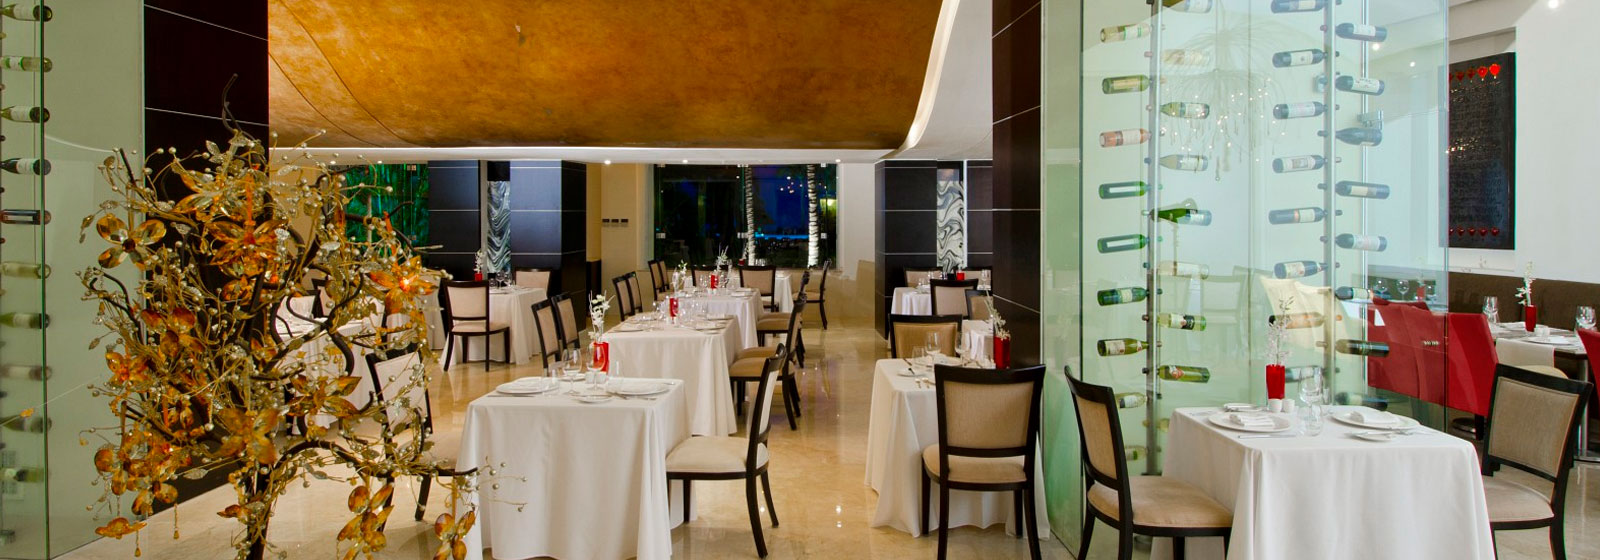 Restaurante Francés Piaf en Grand Velas Riviera Nayarit